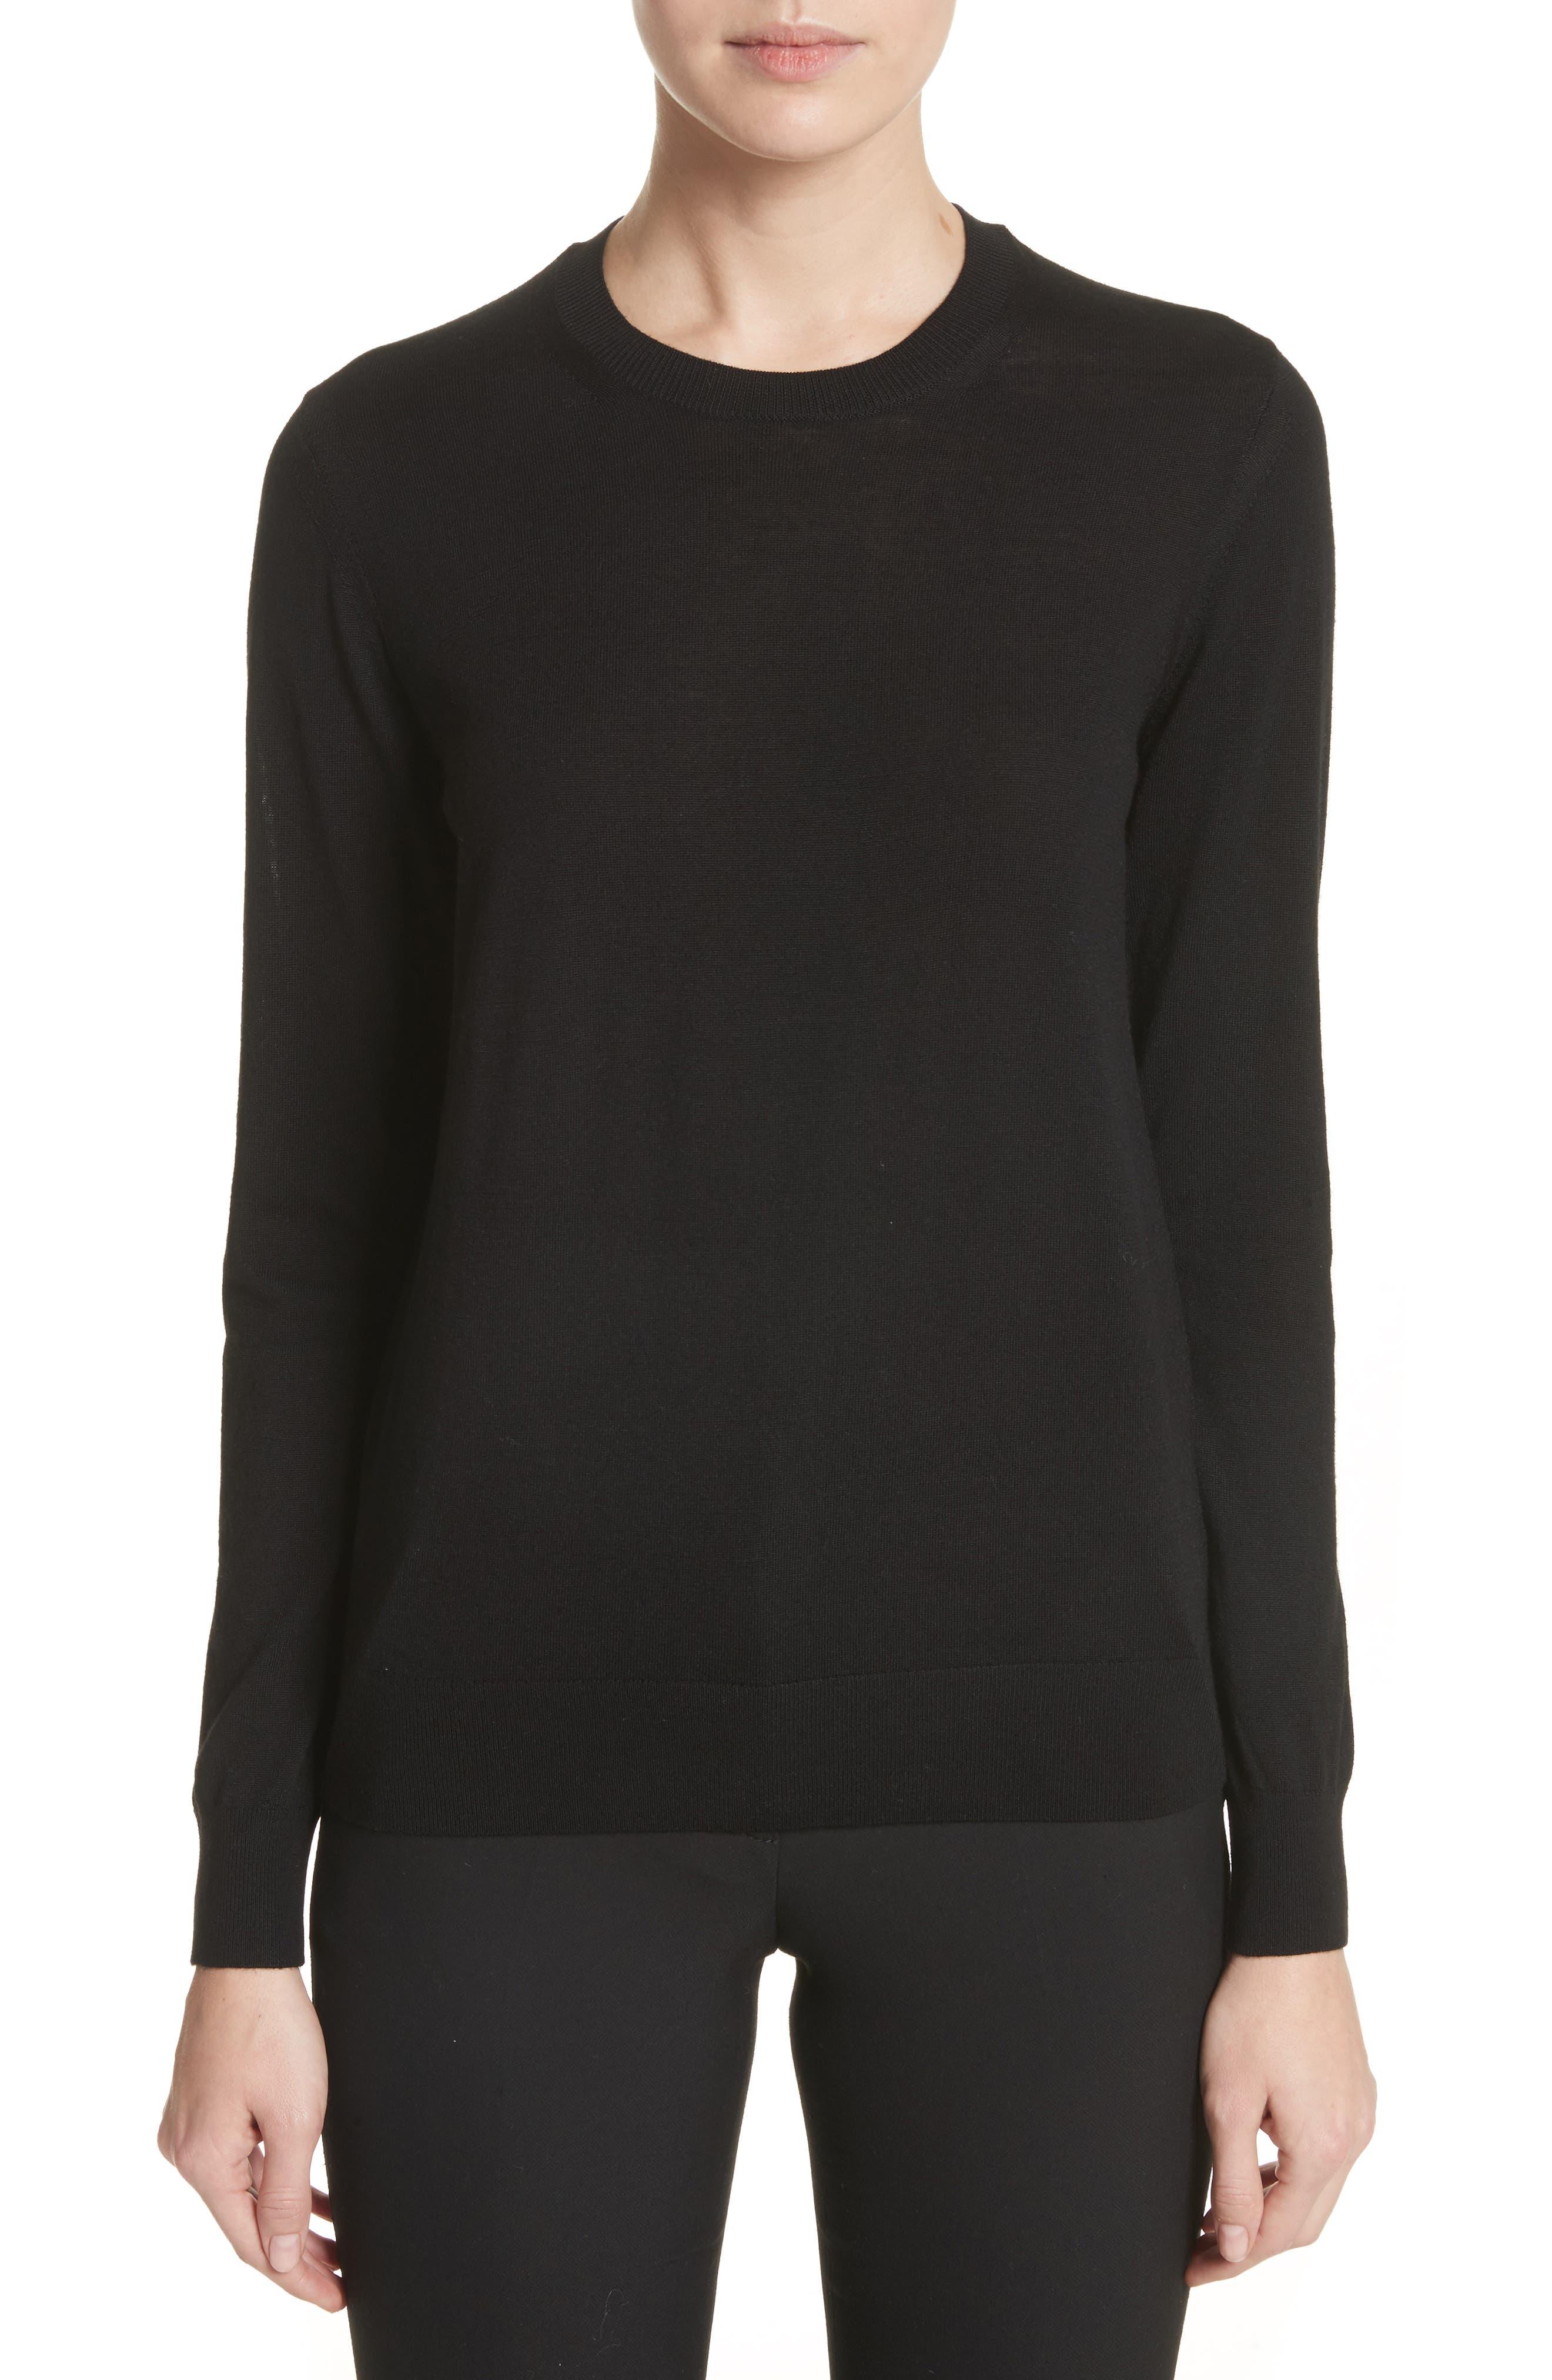 Viar Merino Wool Sweater,                             Main thumbnail 1, color,                             001